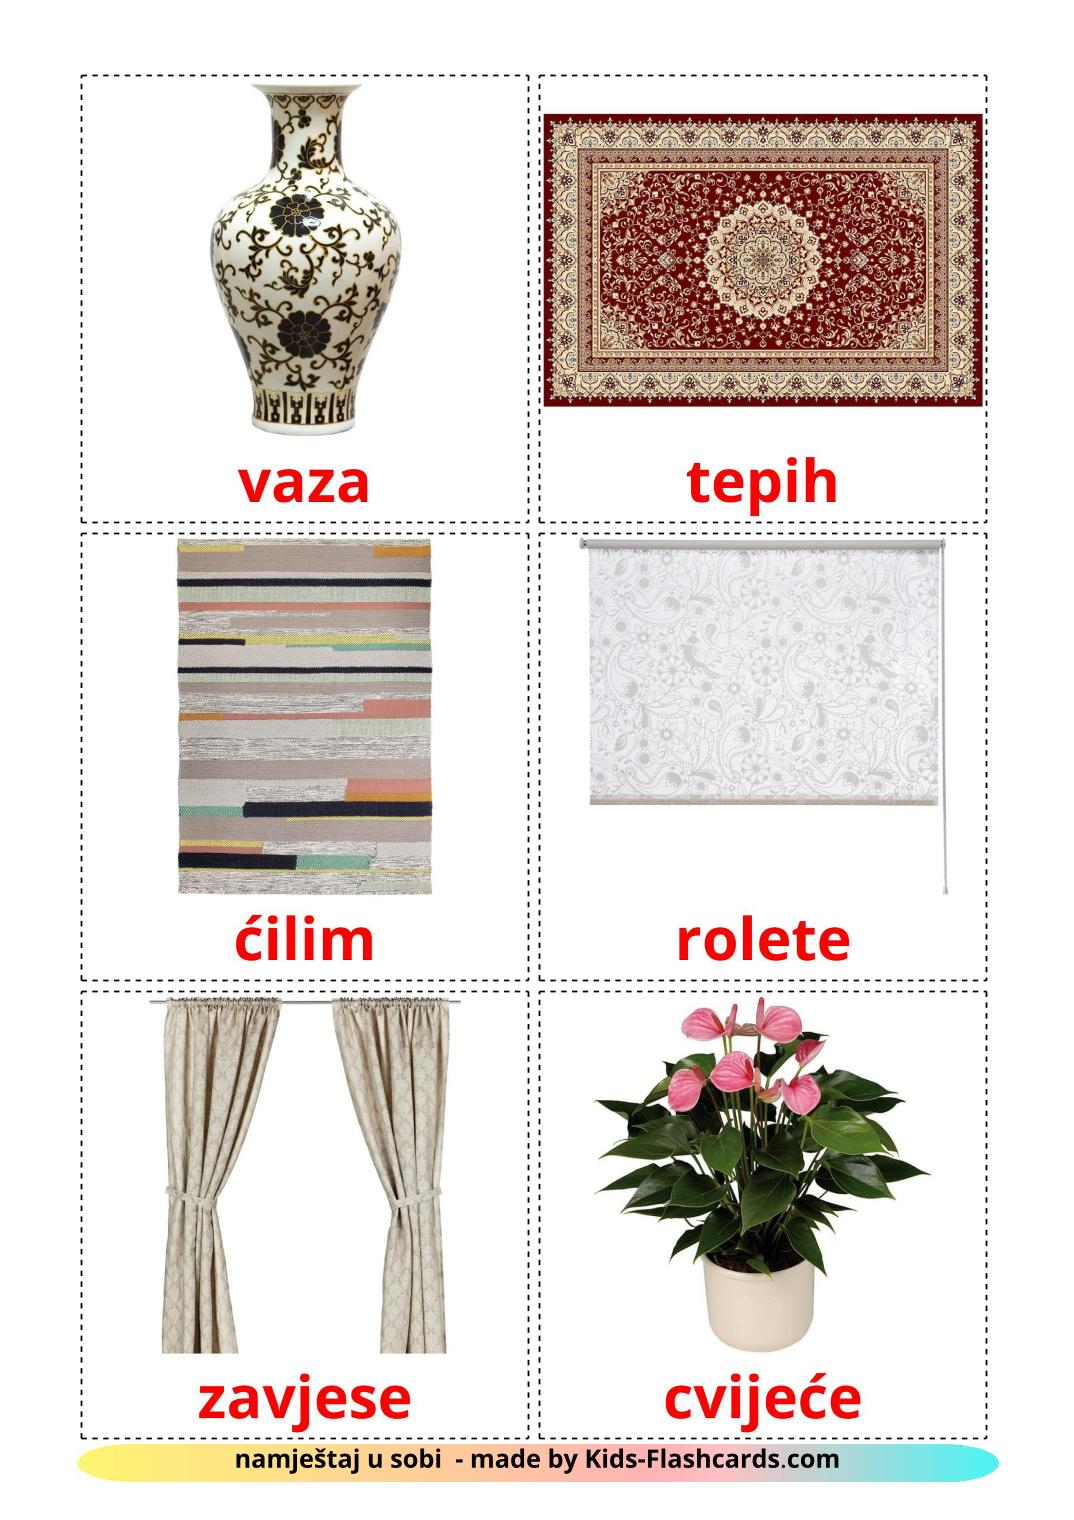 Bedroom accessories - 18 Free Printable croatian Flashcards